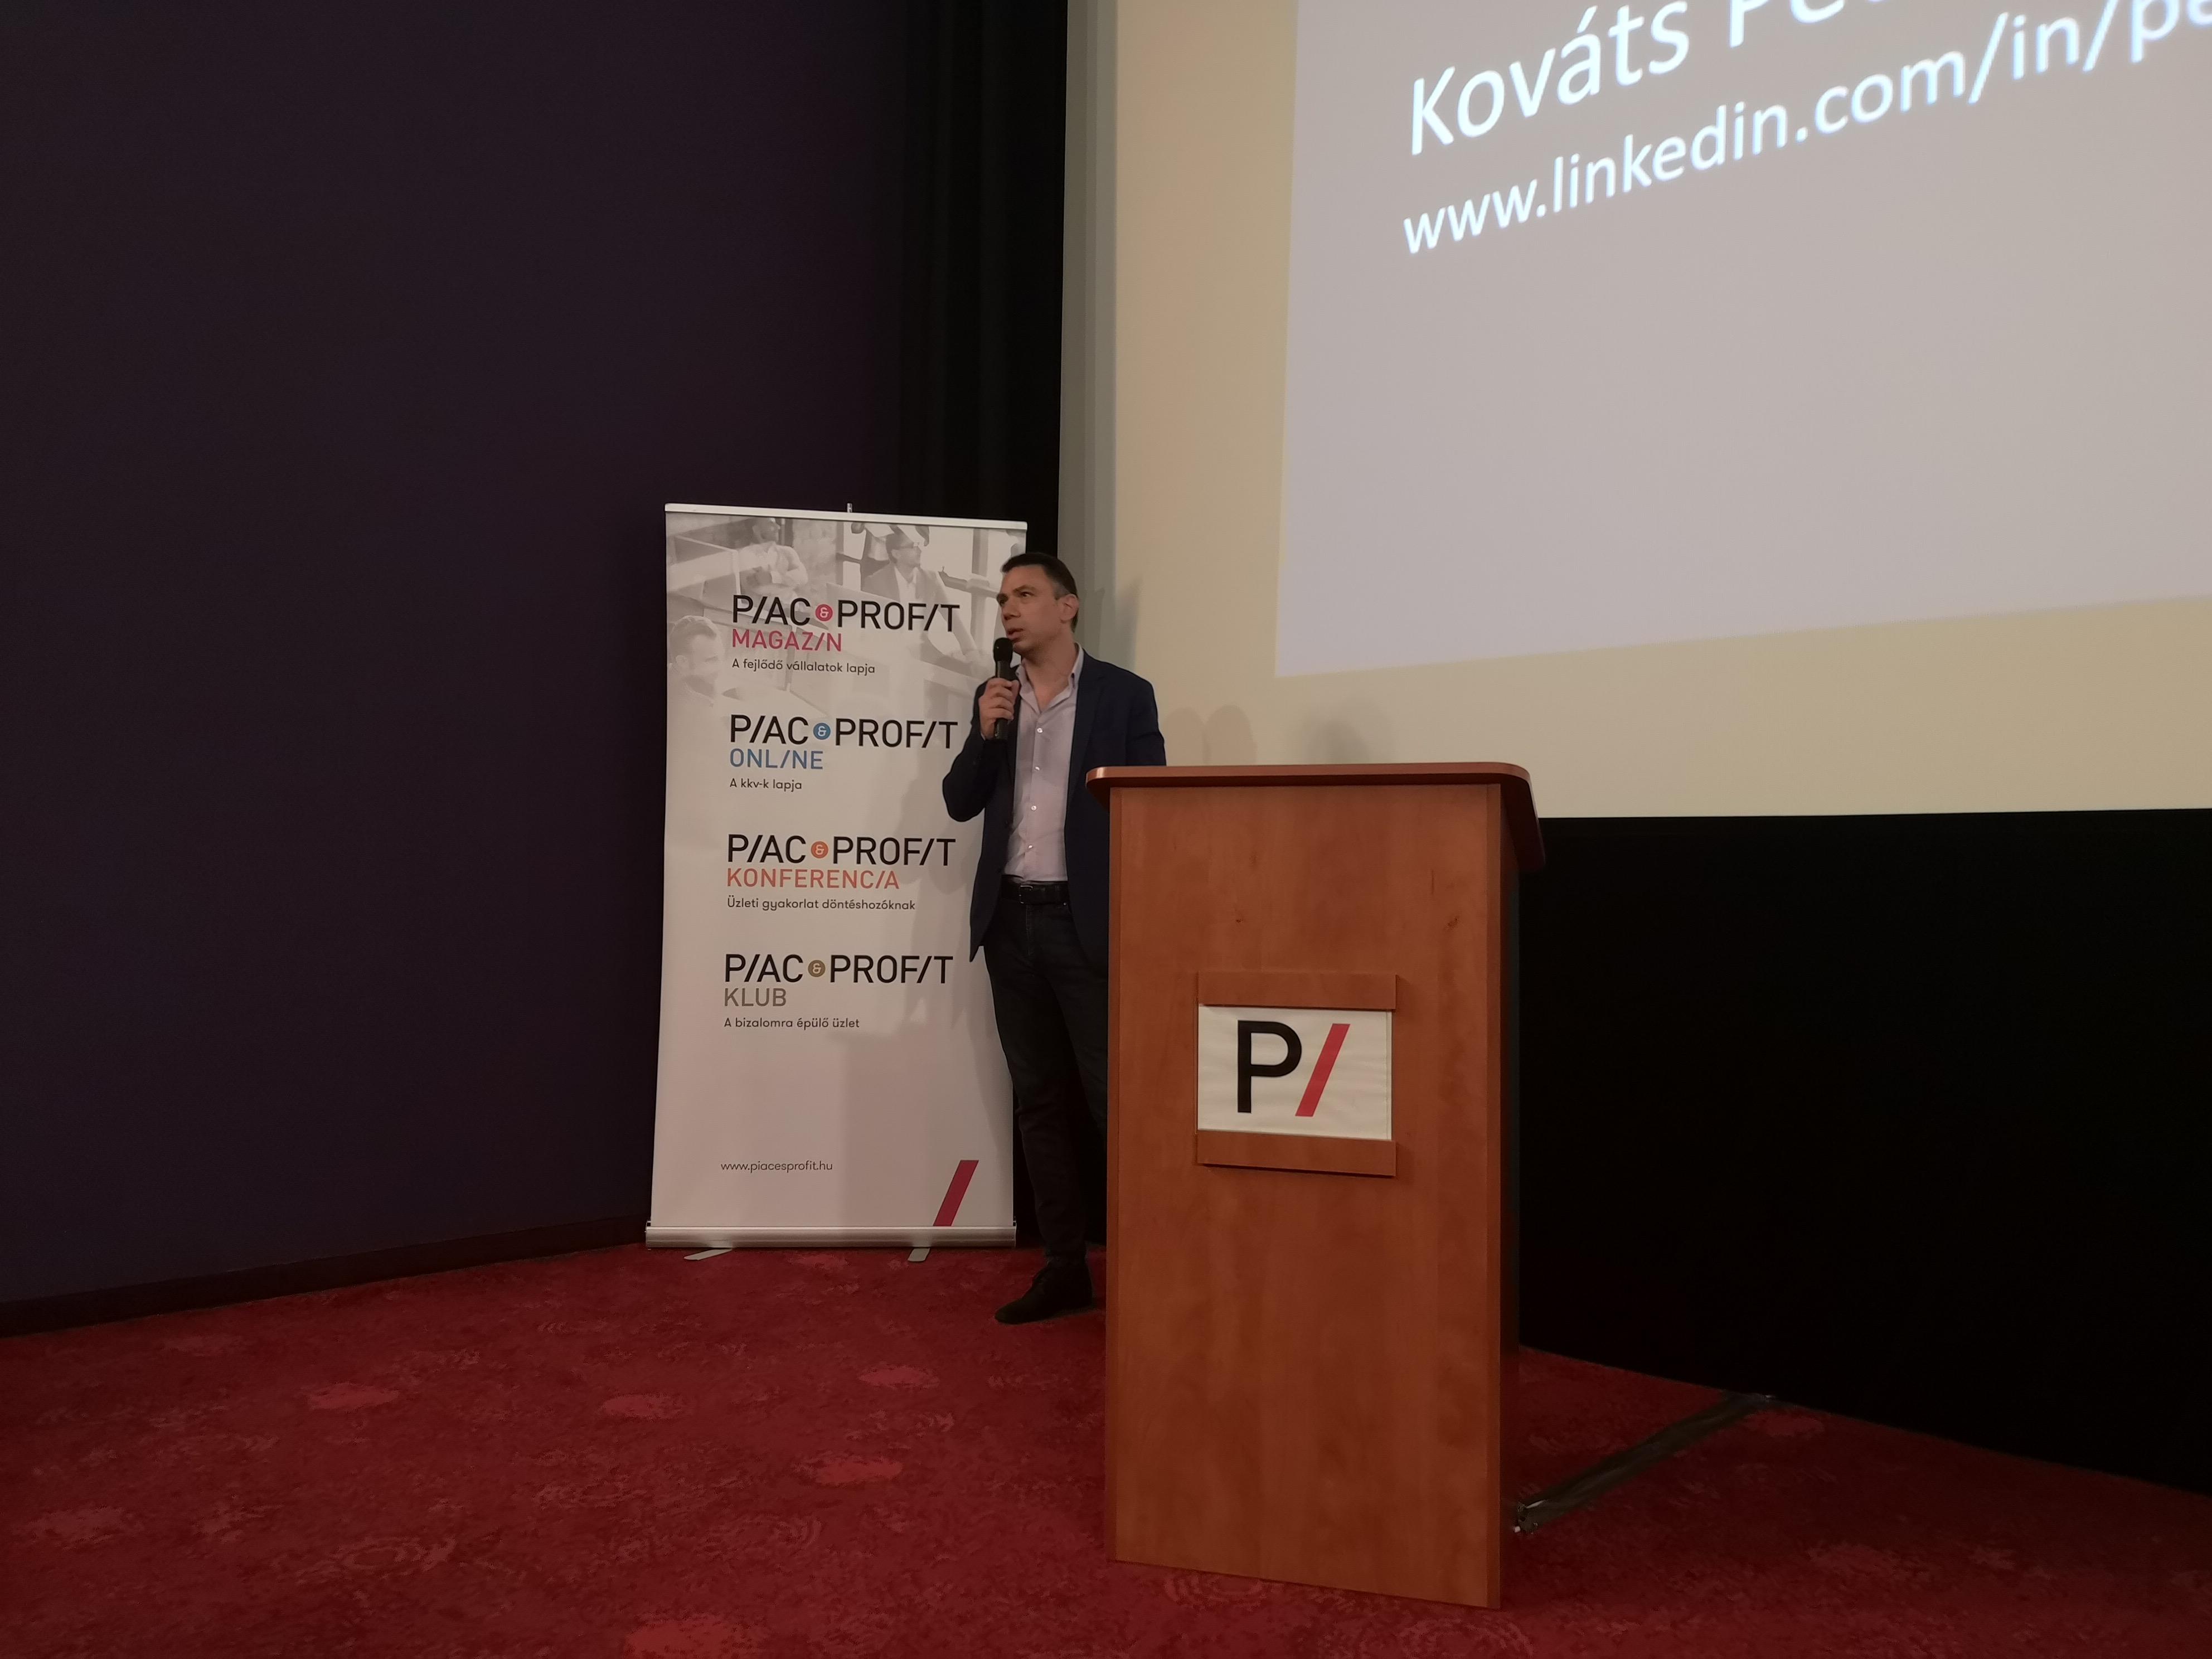 Kováts Péter (Fotó: PP)